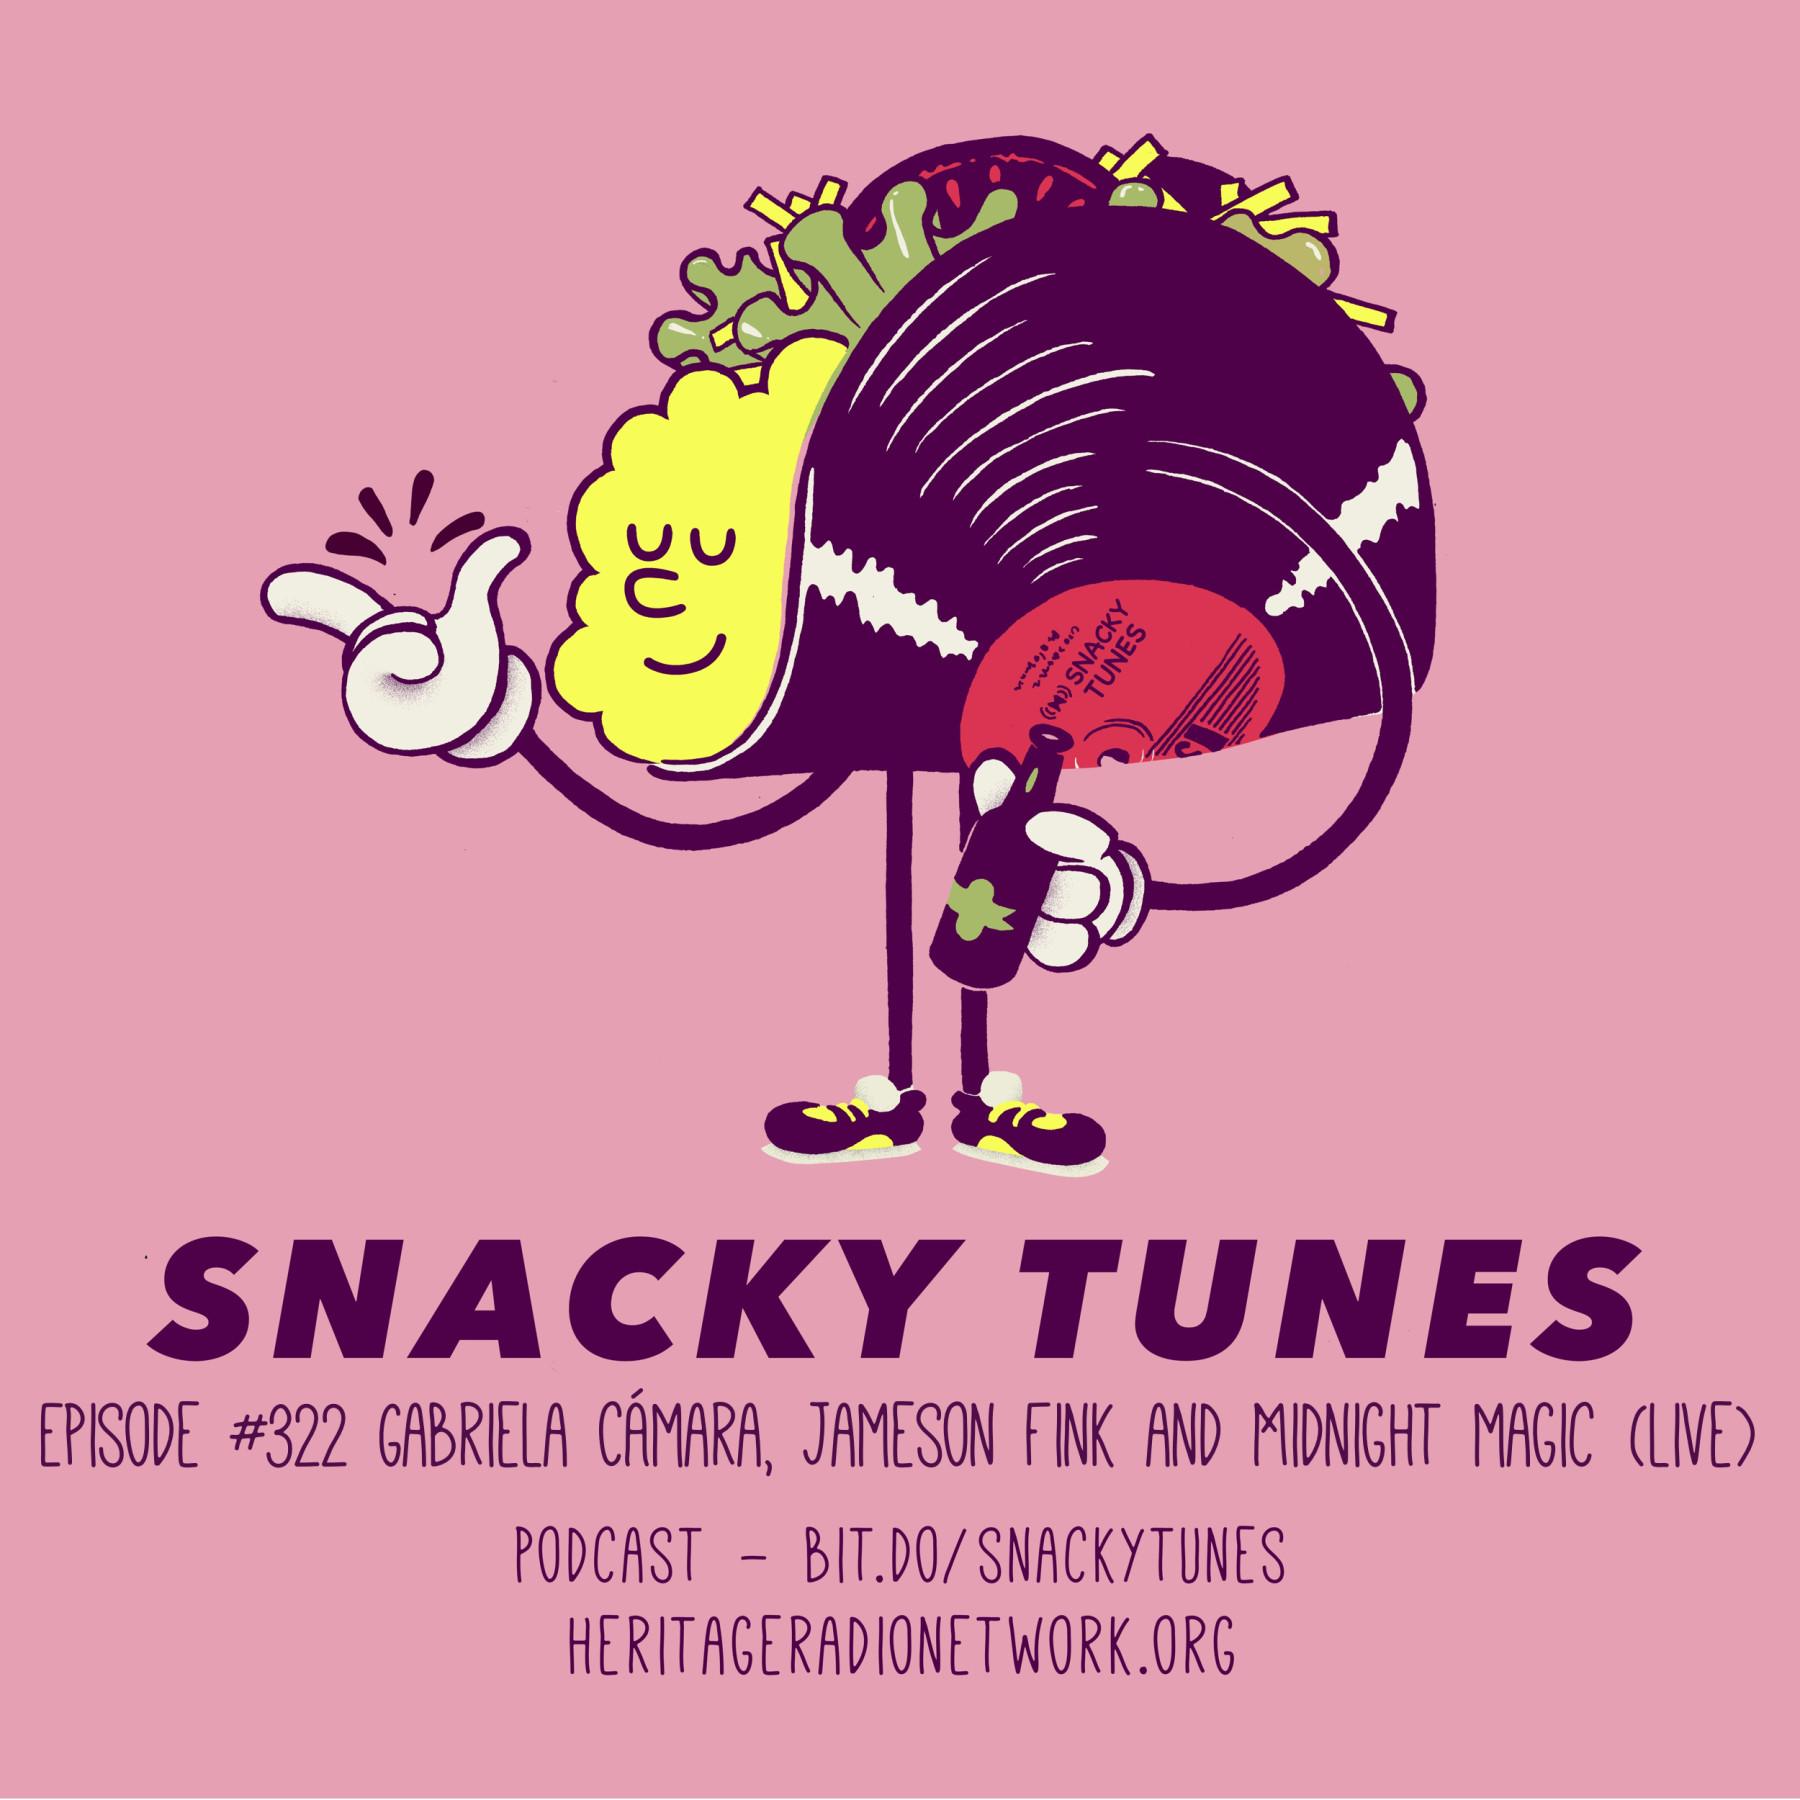 Snacky_Tunes-Podacst_Editable_322.001